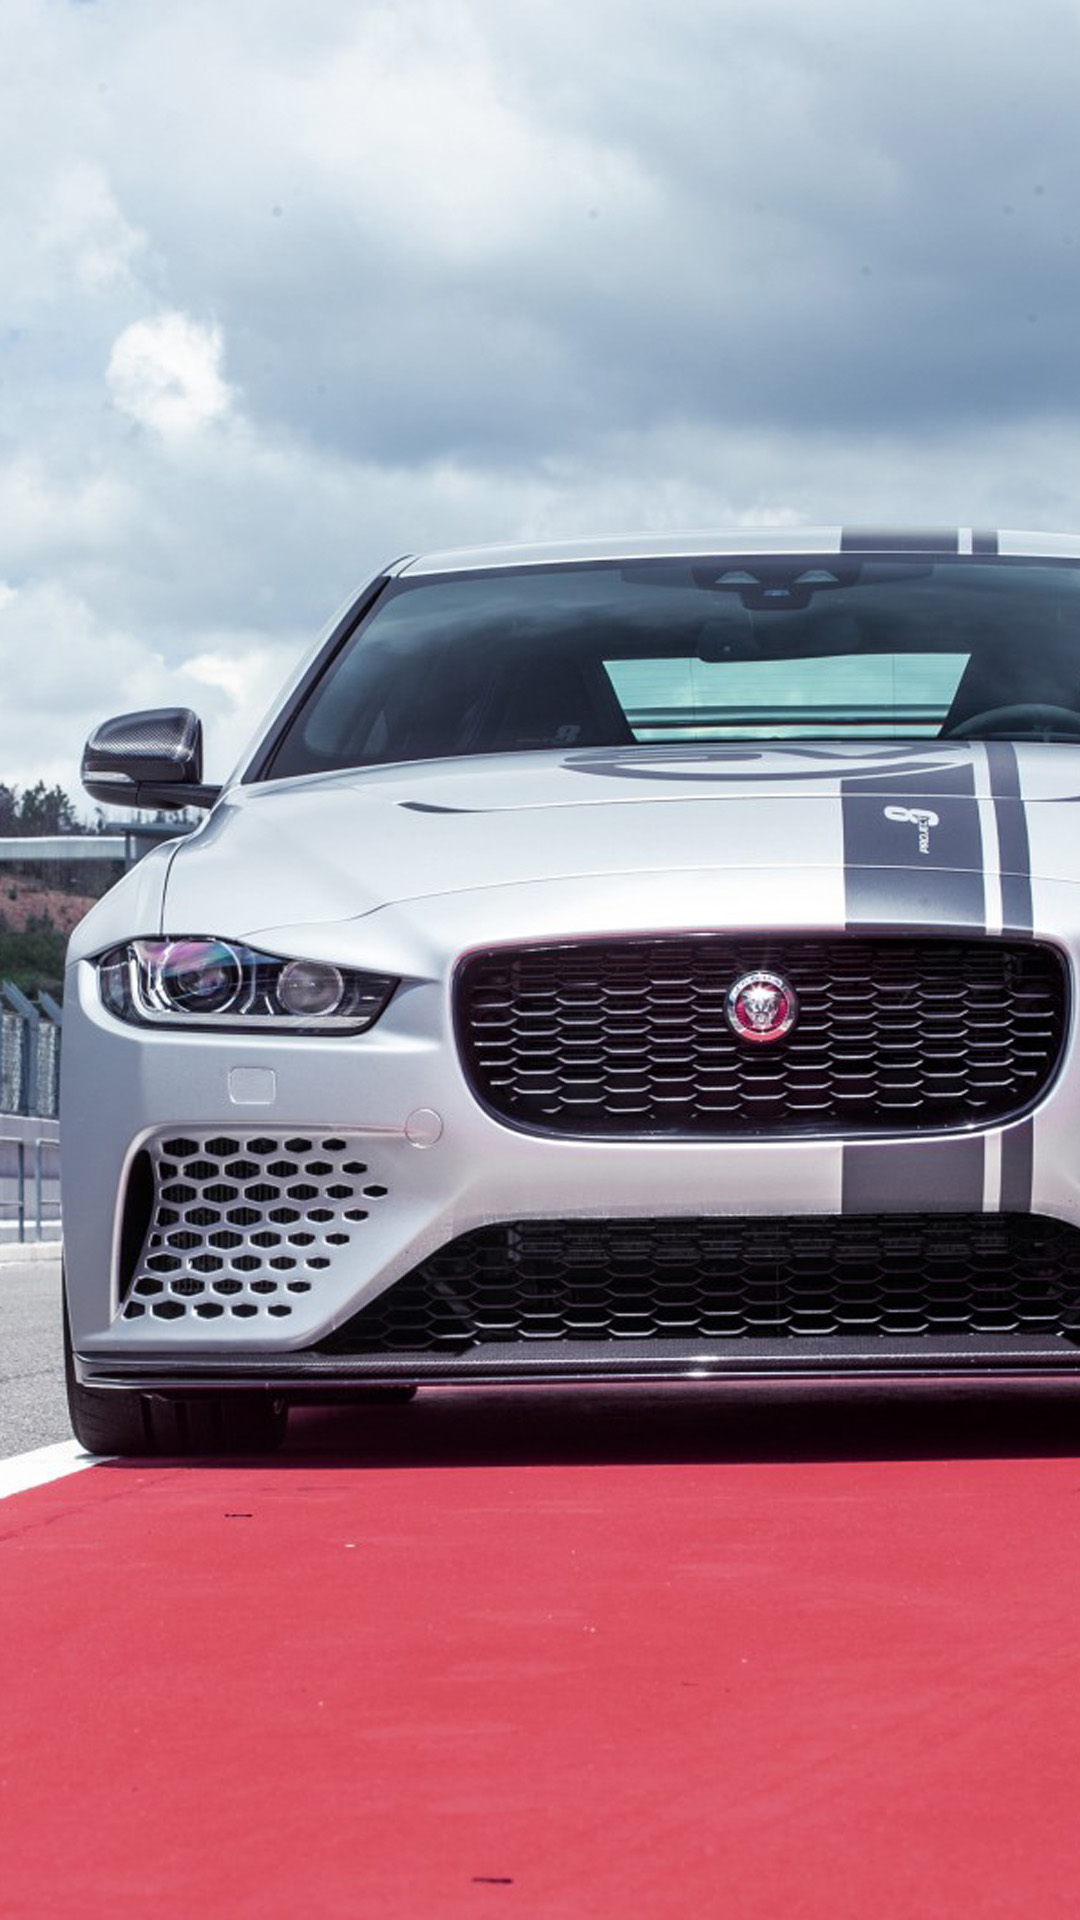 Jaguar Xe Sv Project 8 4k Ultra Hd Mobile Wallpaper